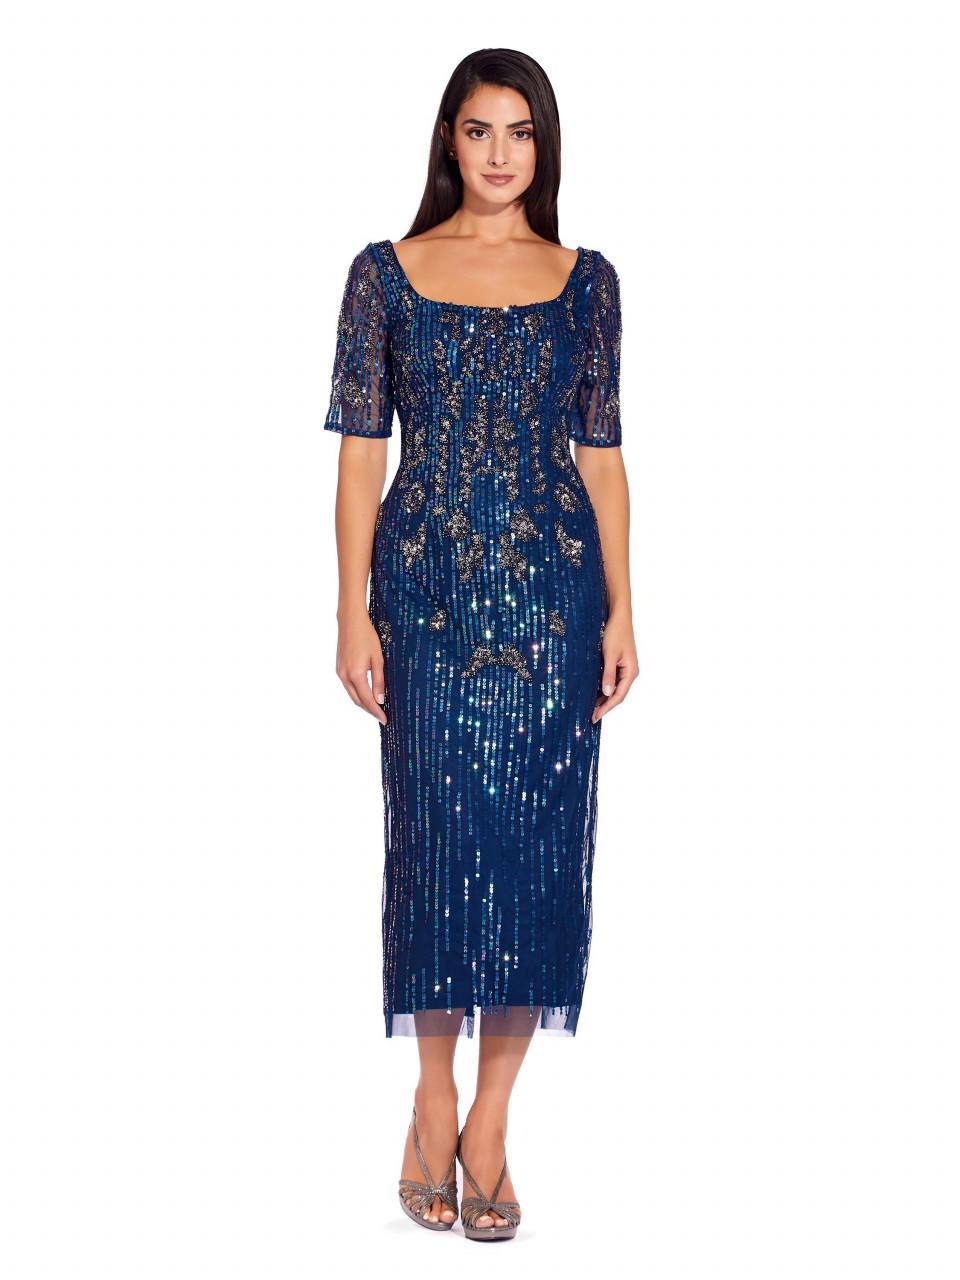 Beaded mesh dress